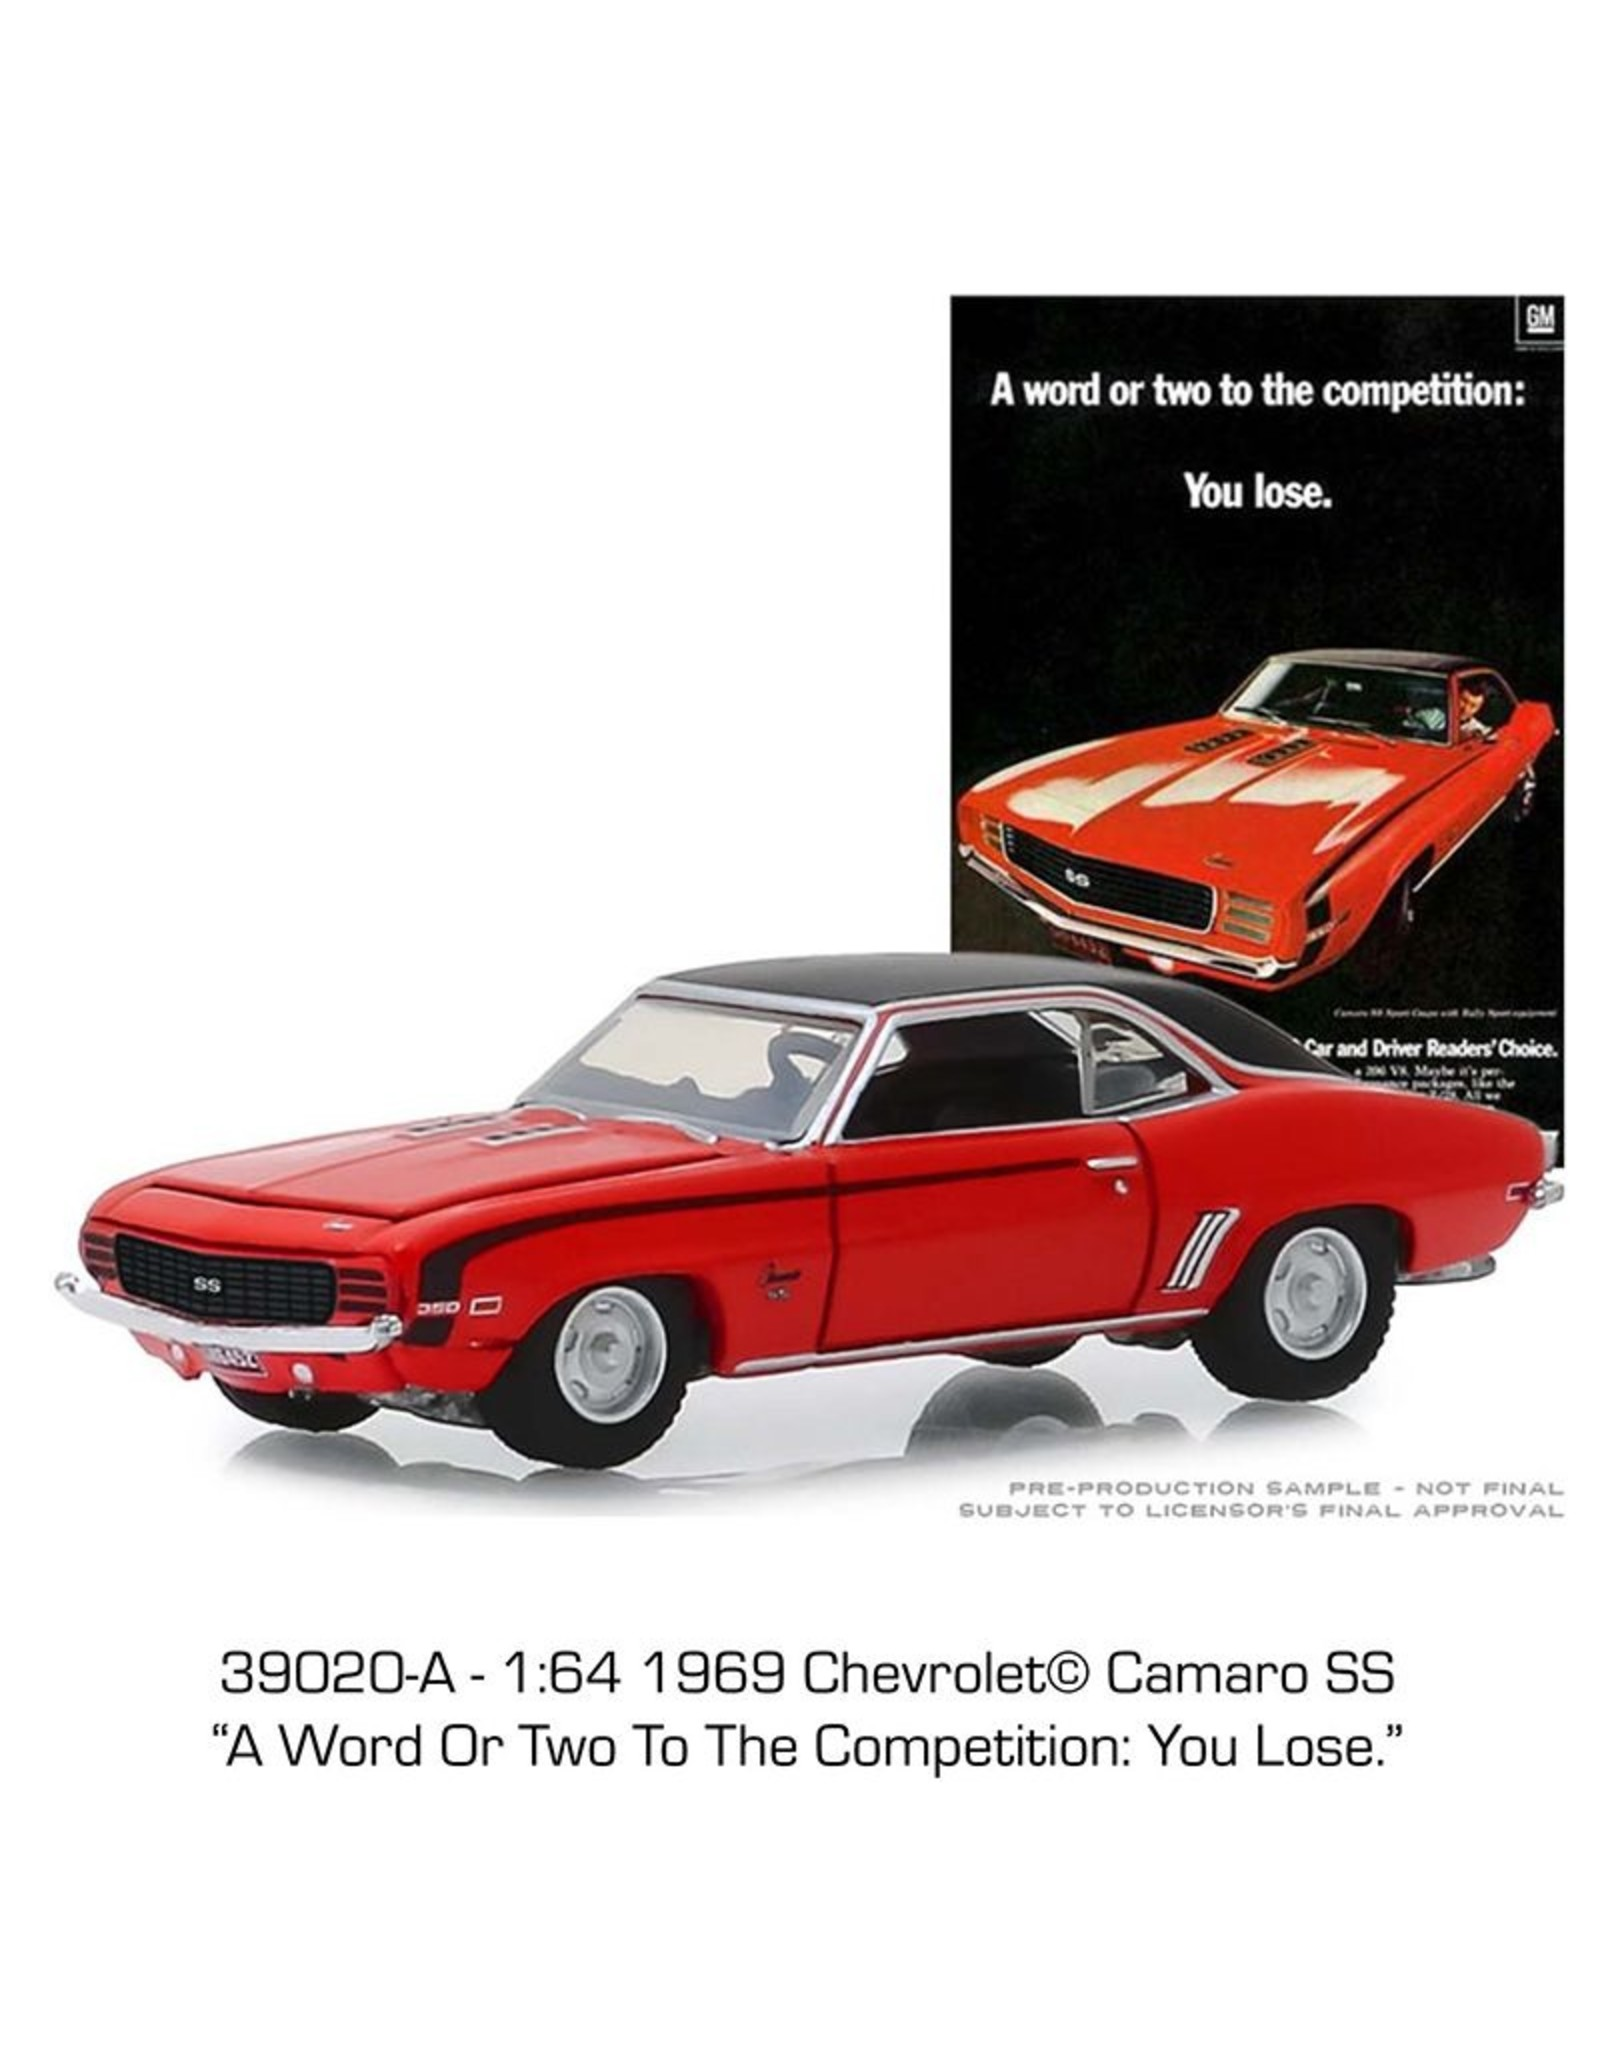 Chevrolet Chevrolet Camaro SS-1969